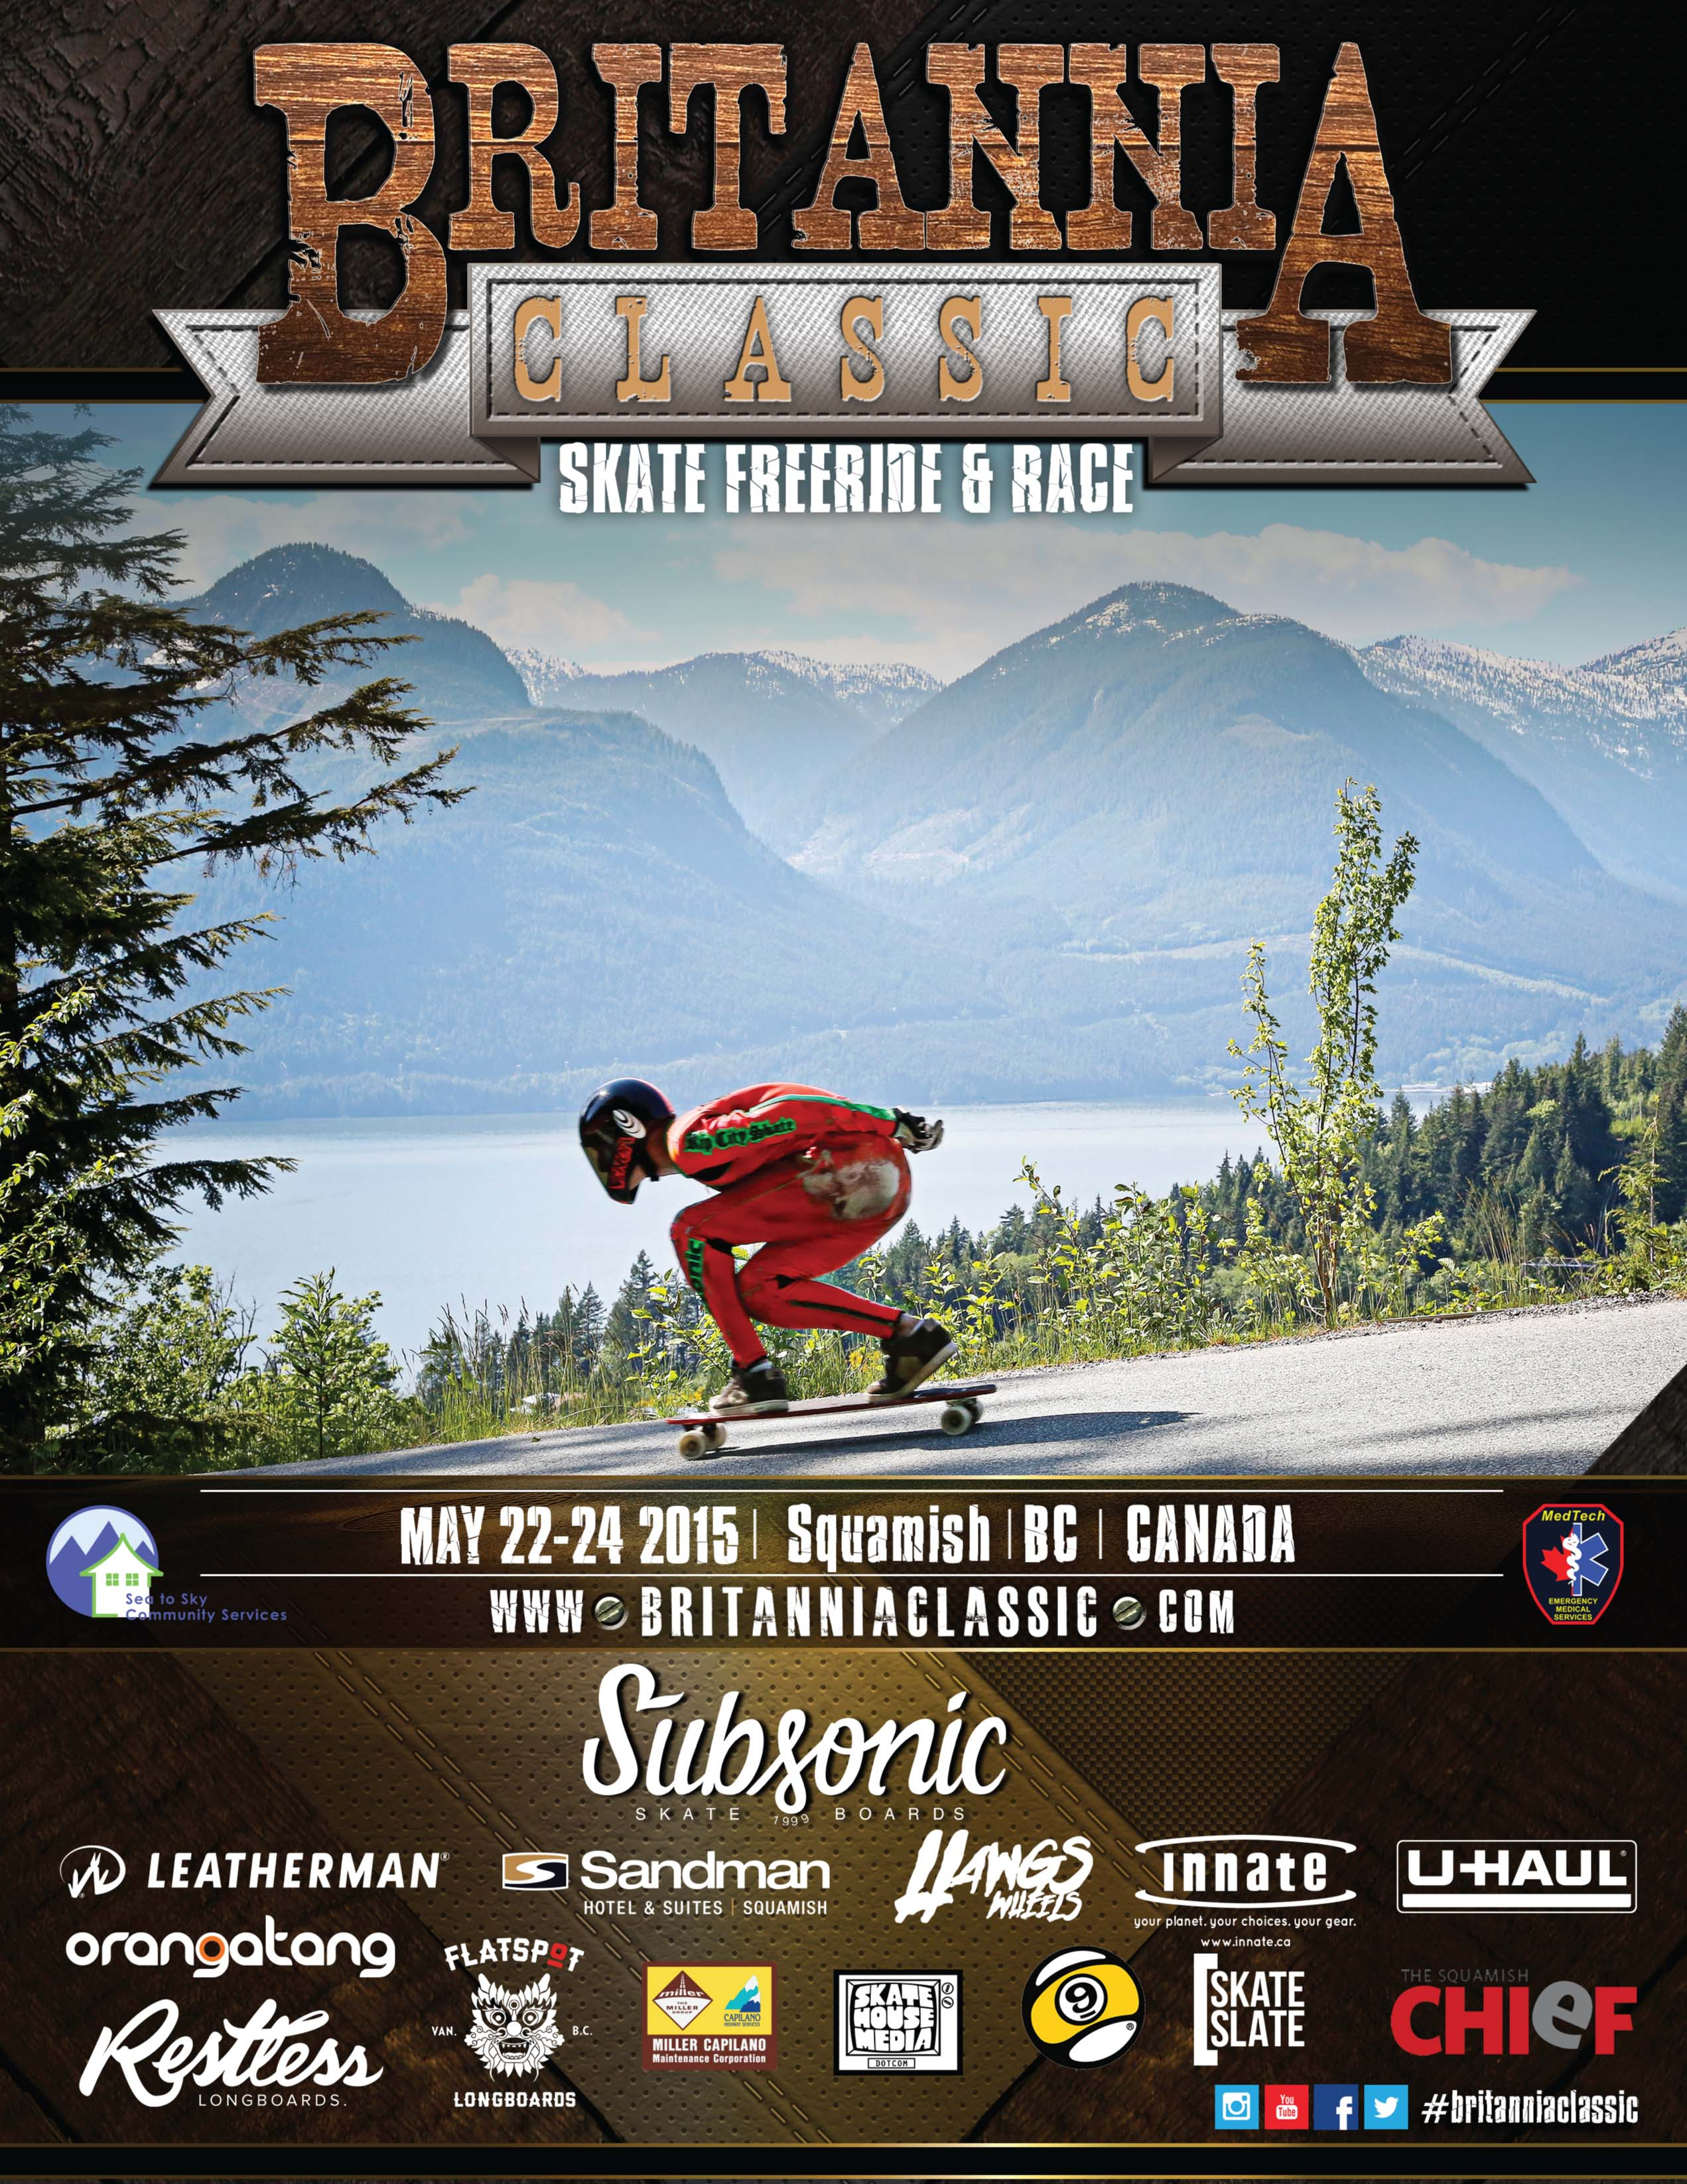 britannia classic, canada, race, downhill, longboard girls crew, longboarding, skate, skate fast, cool, event, rad